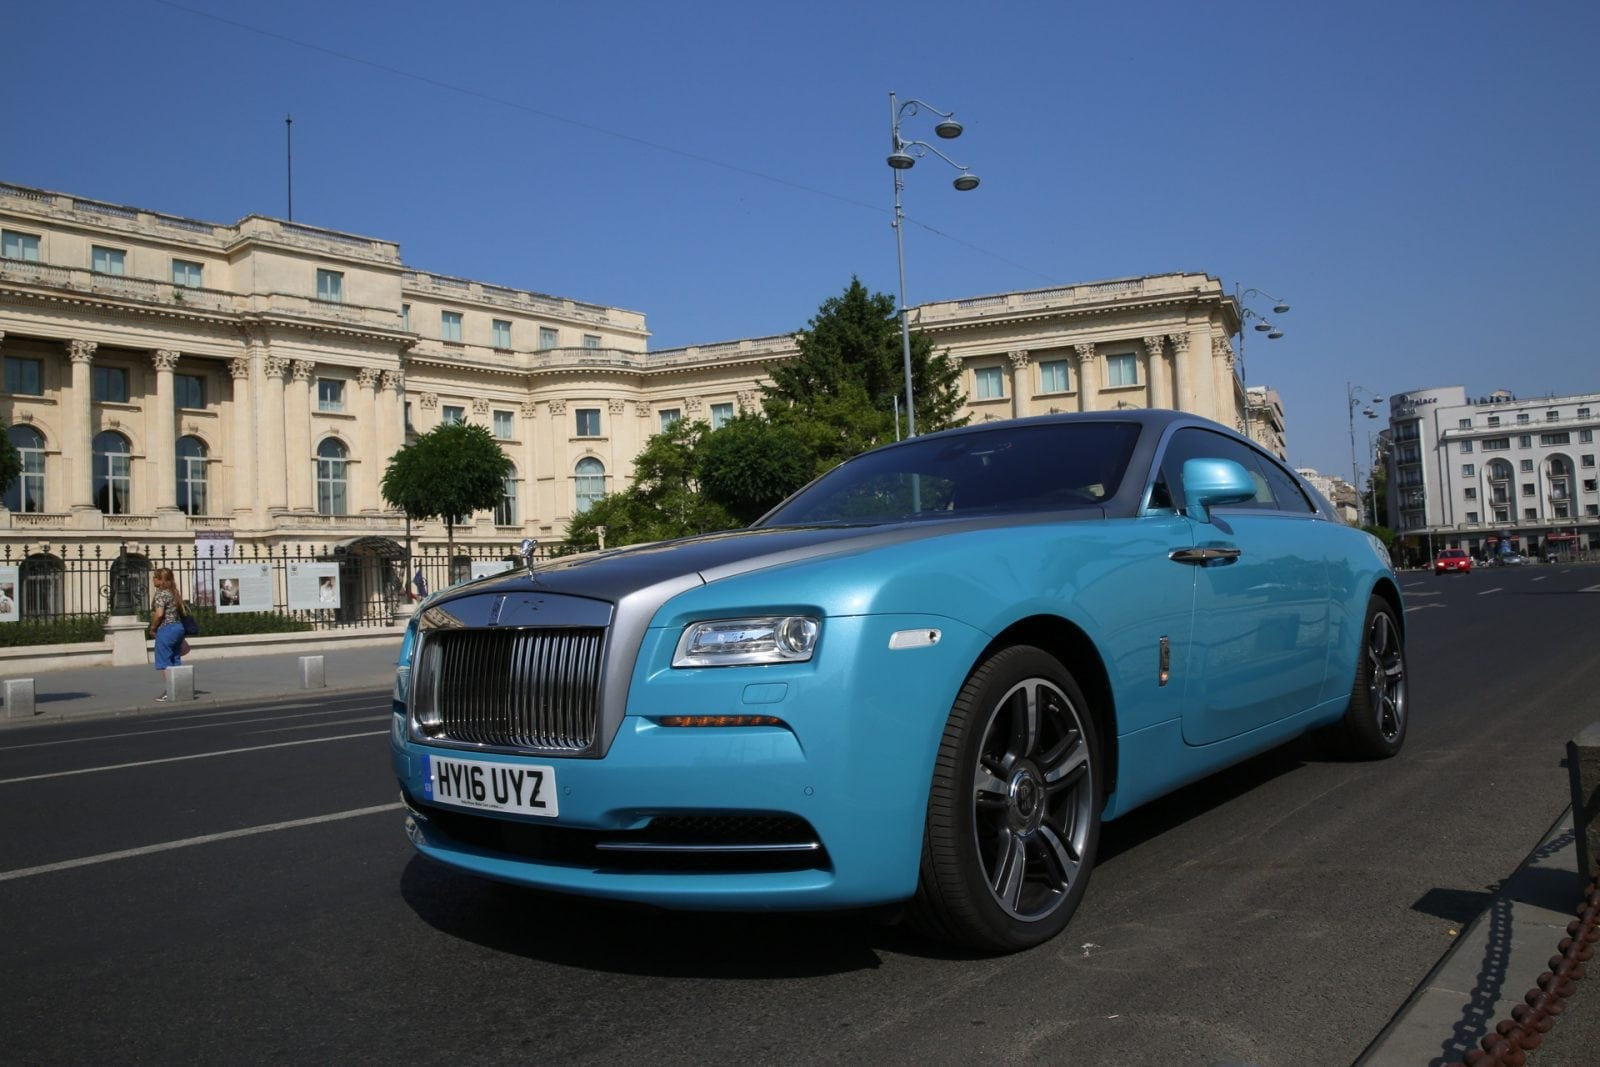 Rolls-Royce Motor Cars Ltd